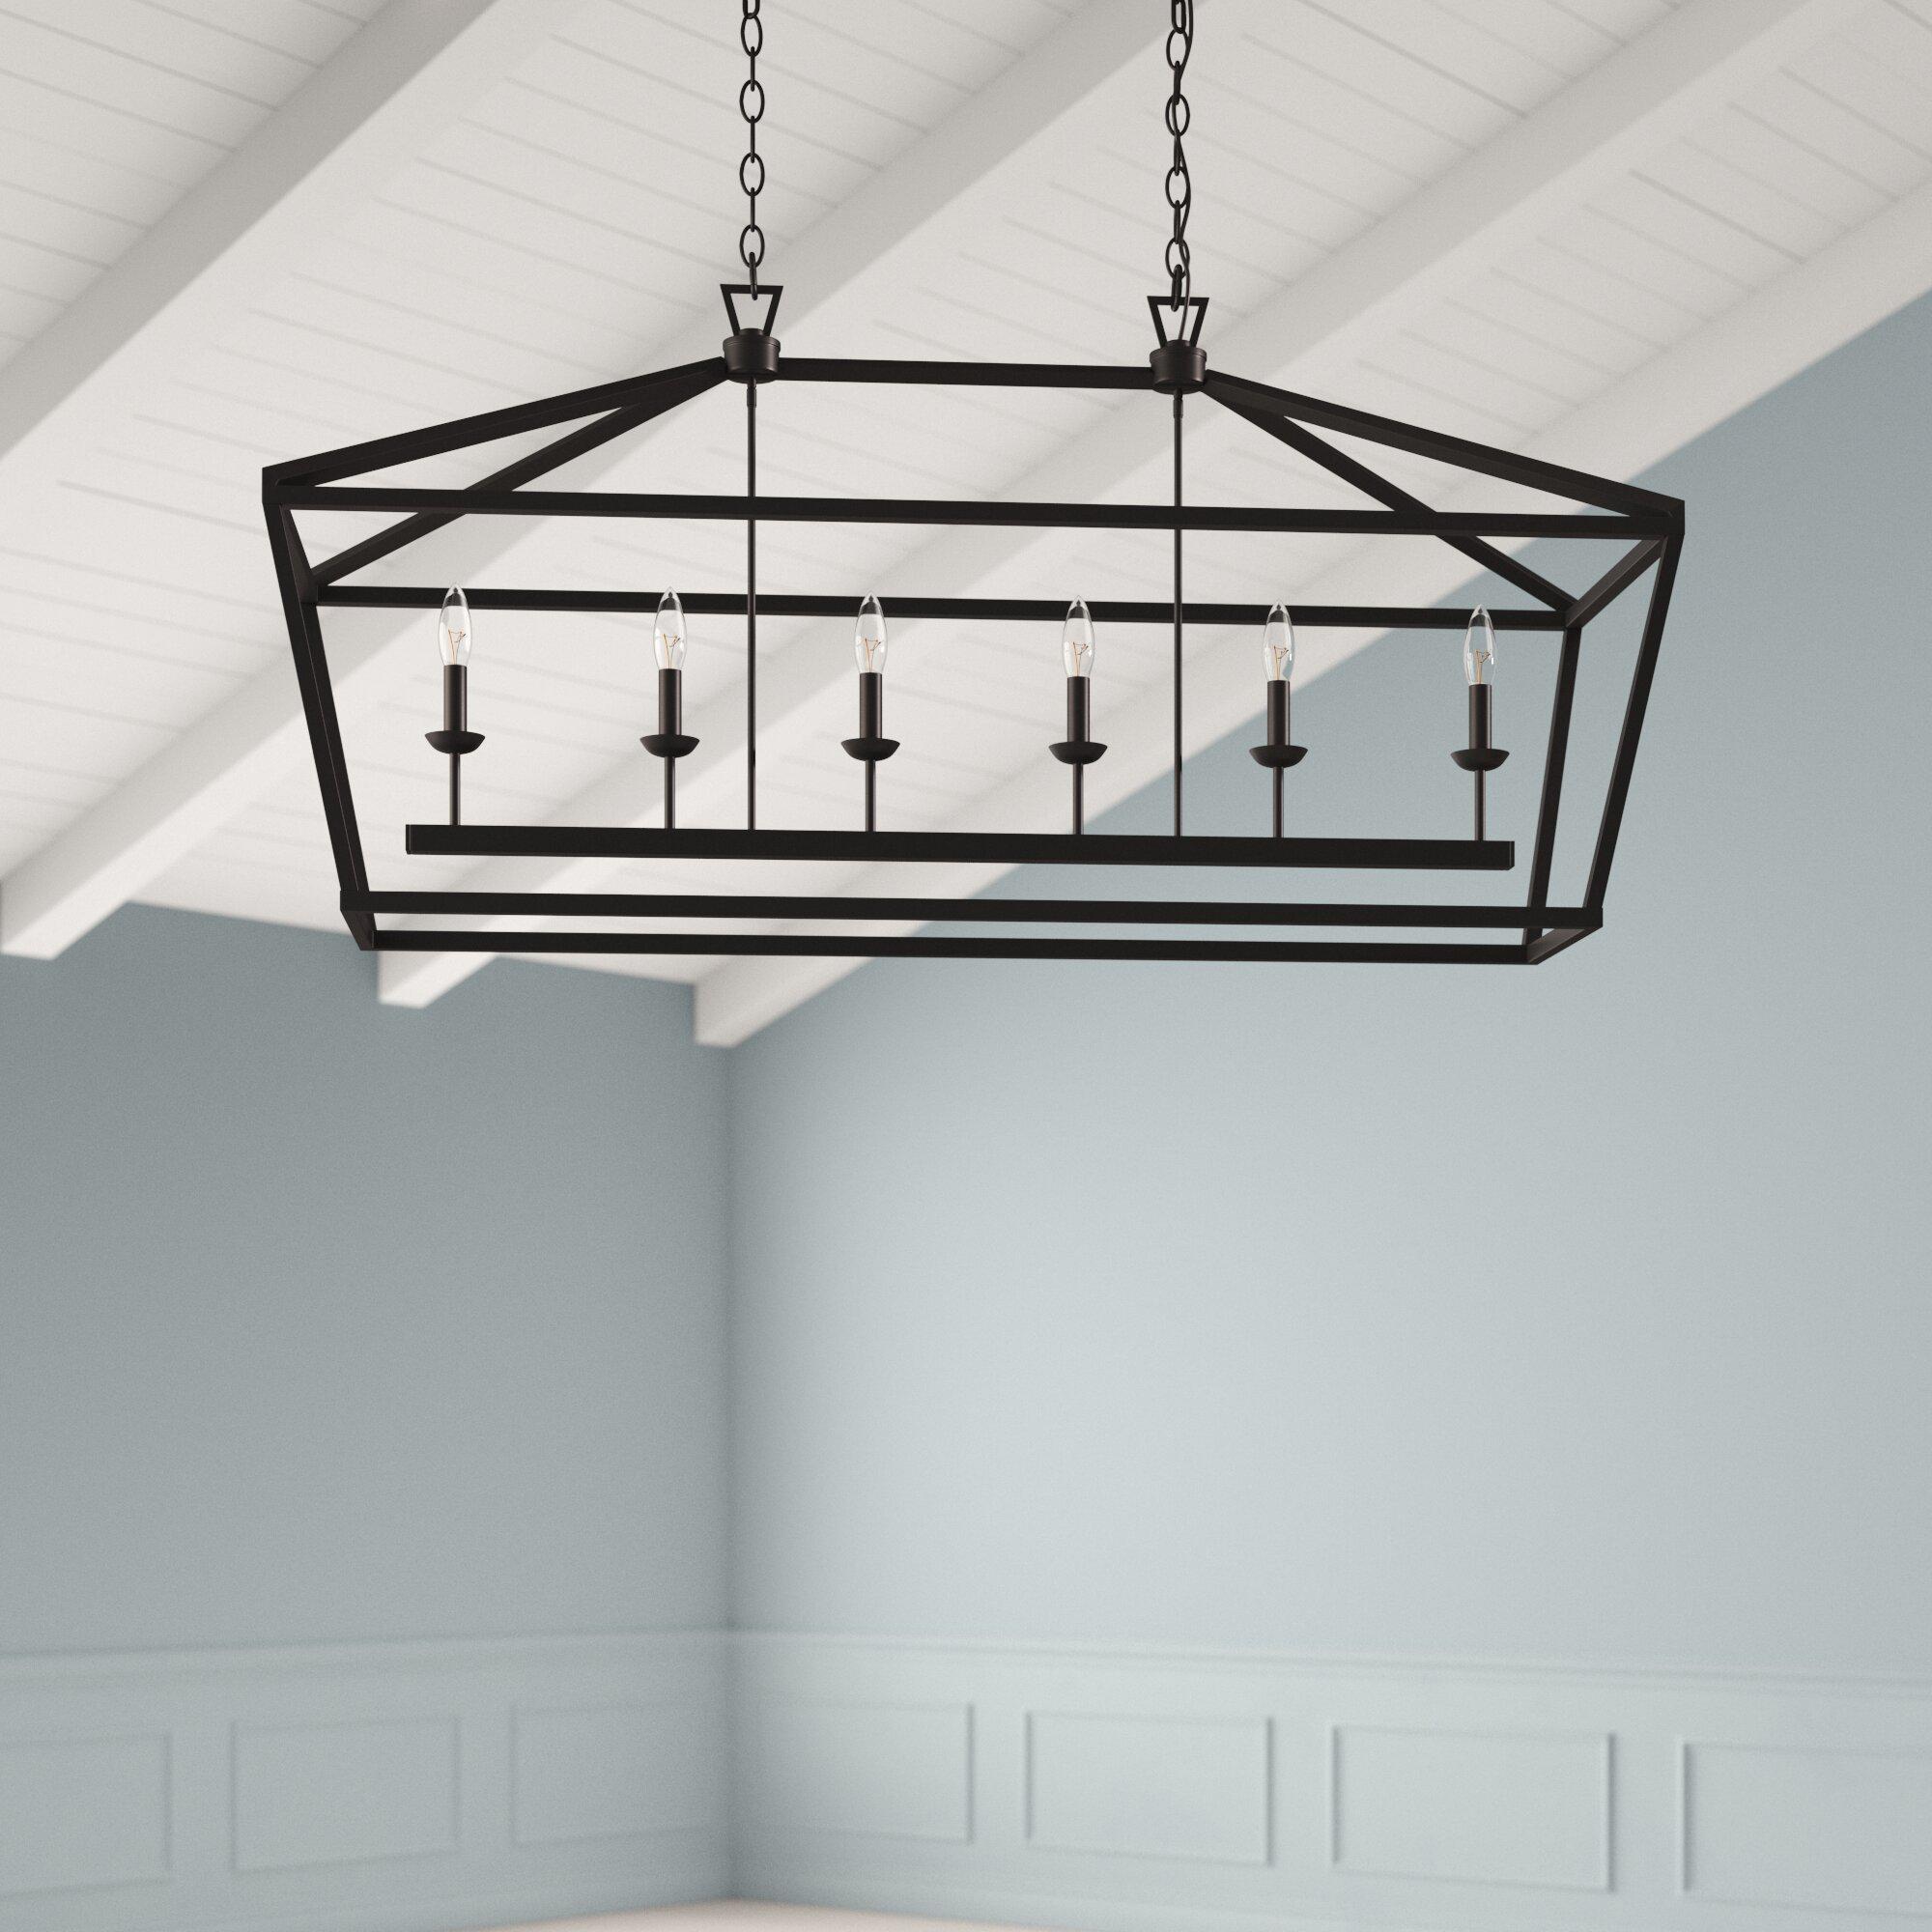 4 Light Kitchen Island Pendant Light Modern Industrial Chandelier Matte Black Box Frame Design No Bulb Included Ceiling Lights Bonsaipaisajismo Lighting Ceiling Fans